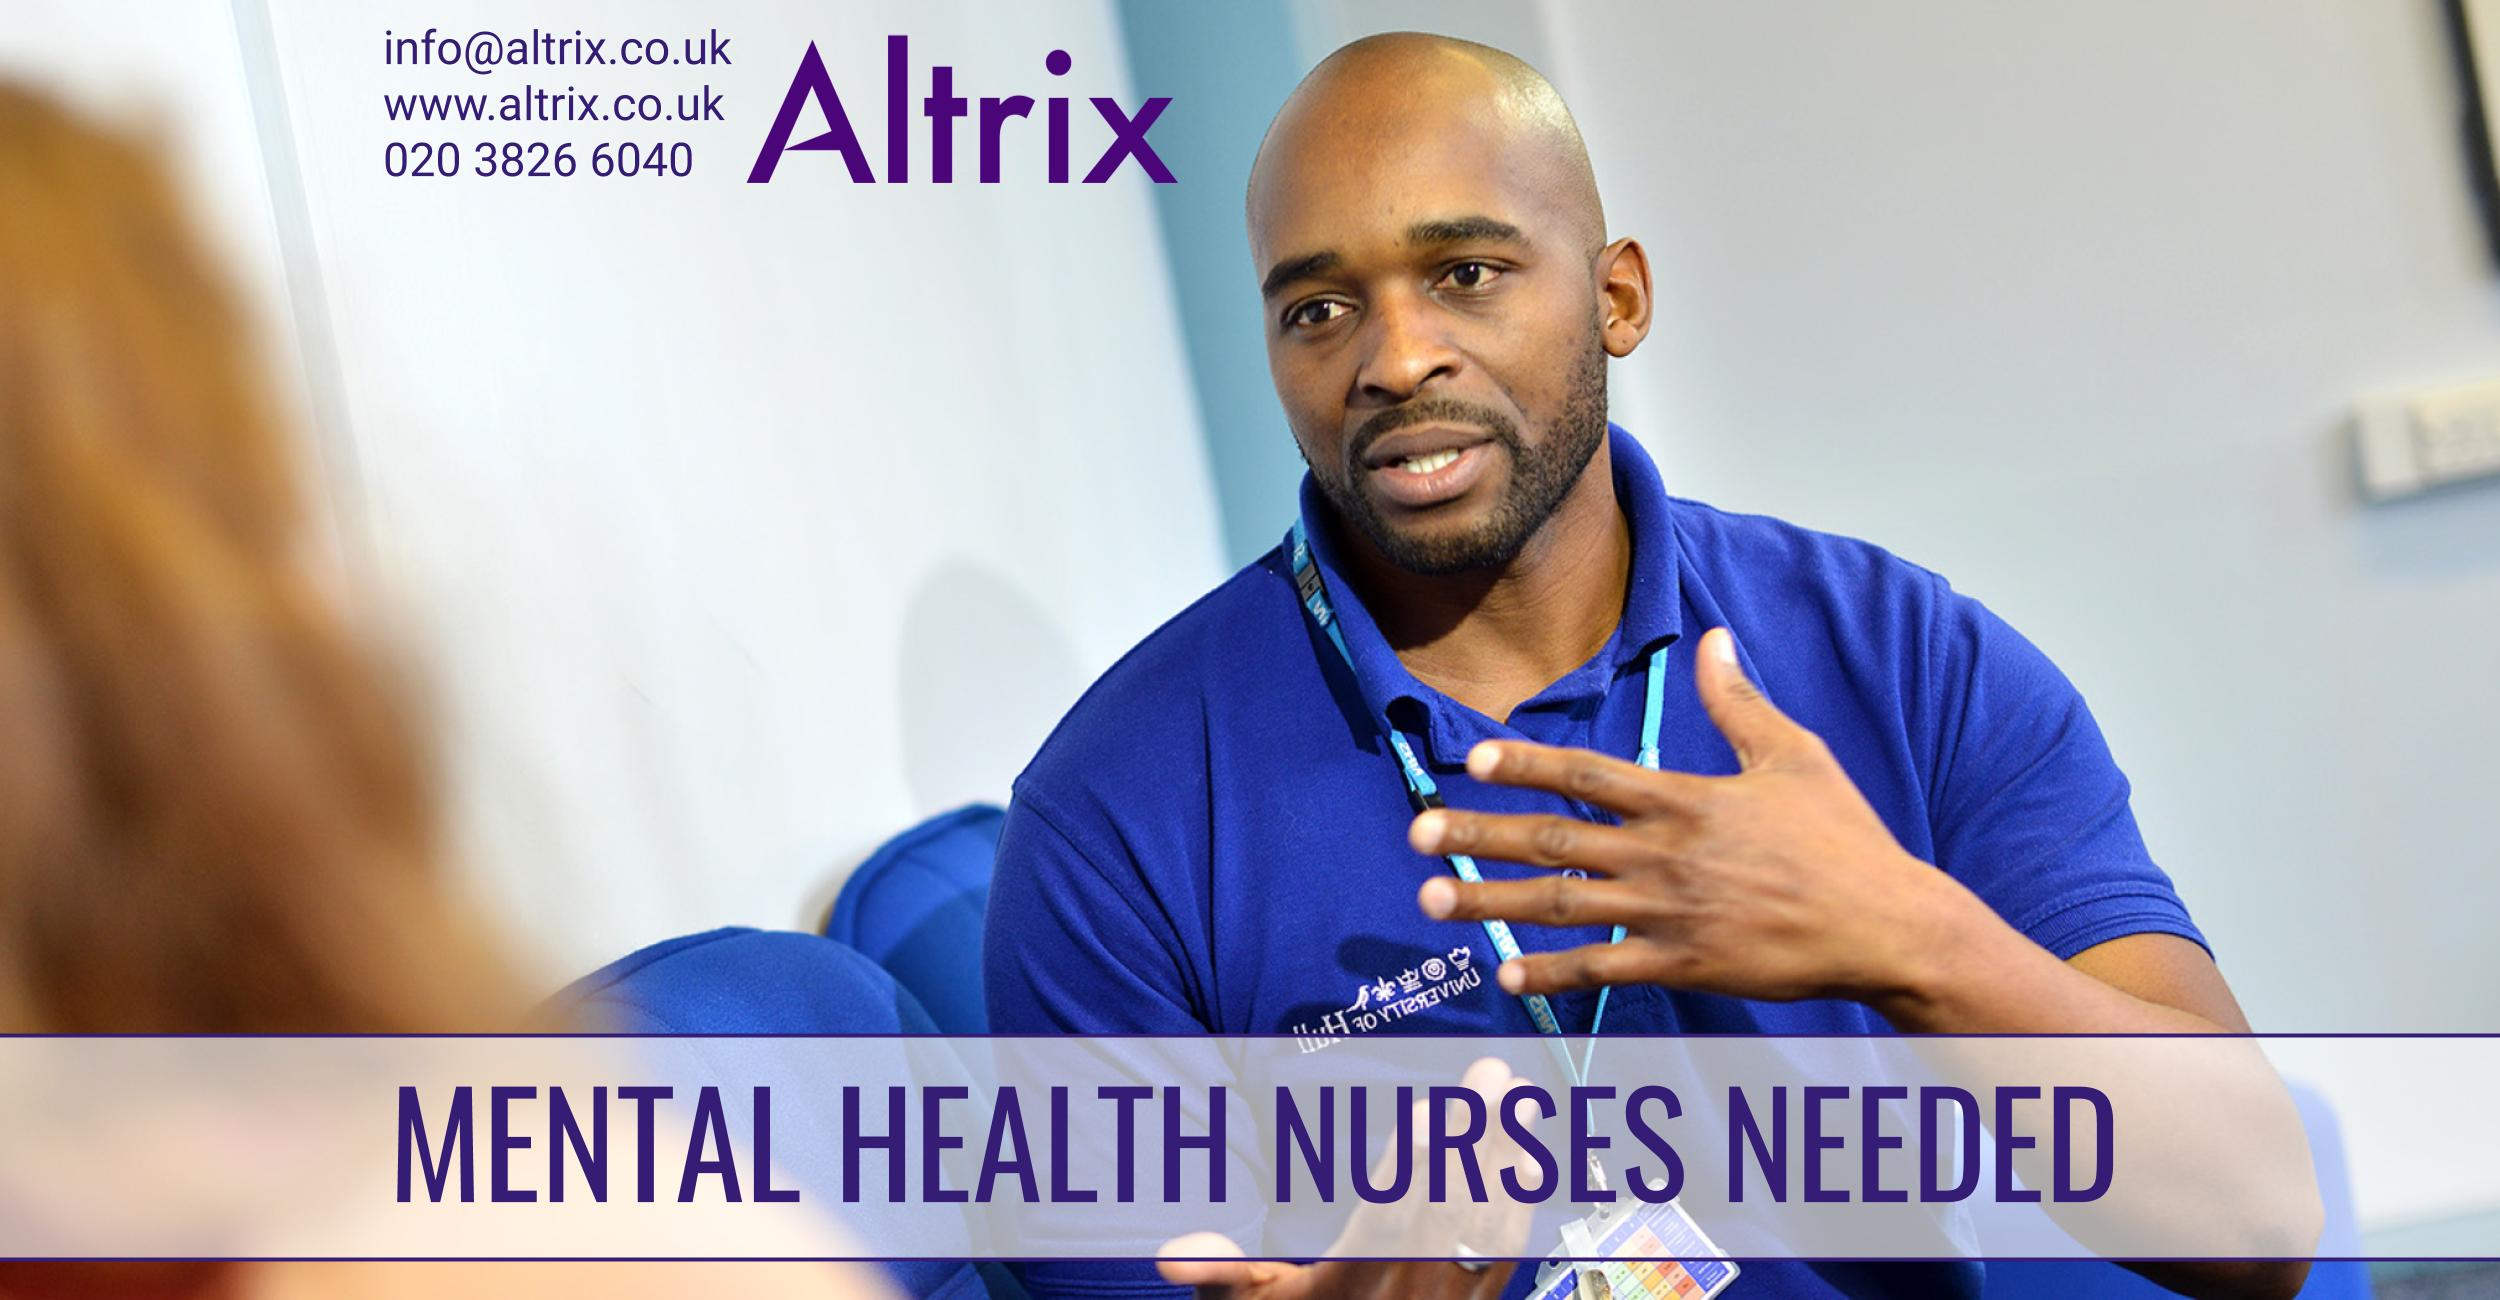 mental health workers RMNs altrix